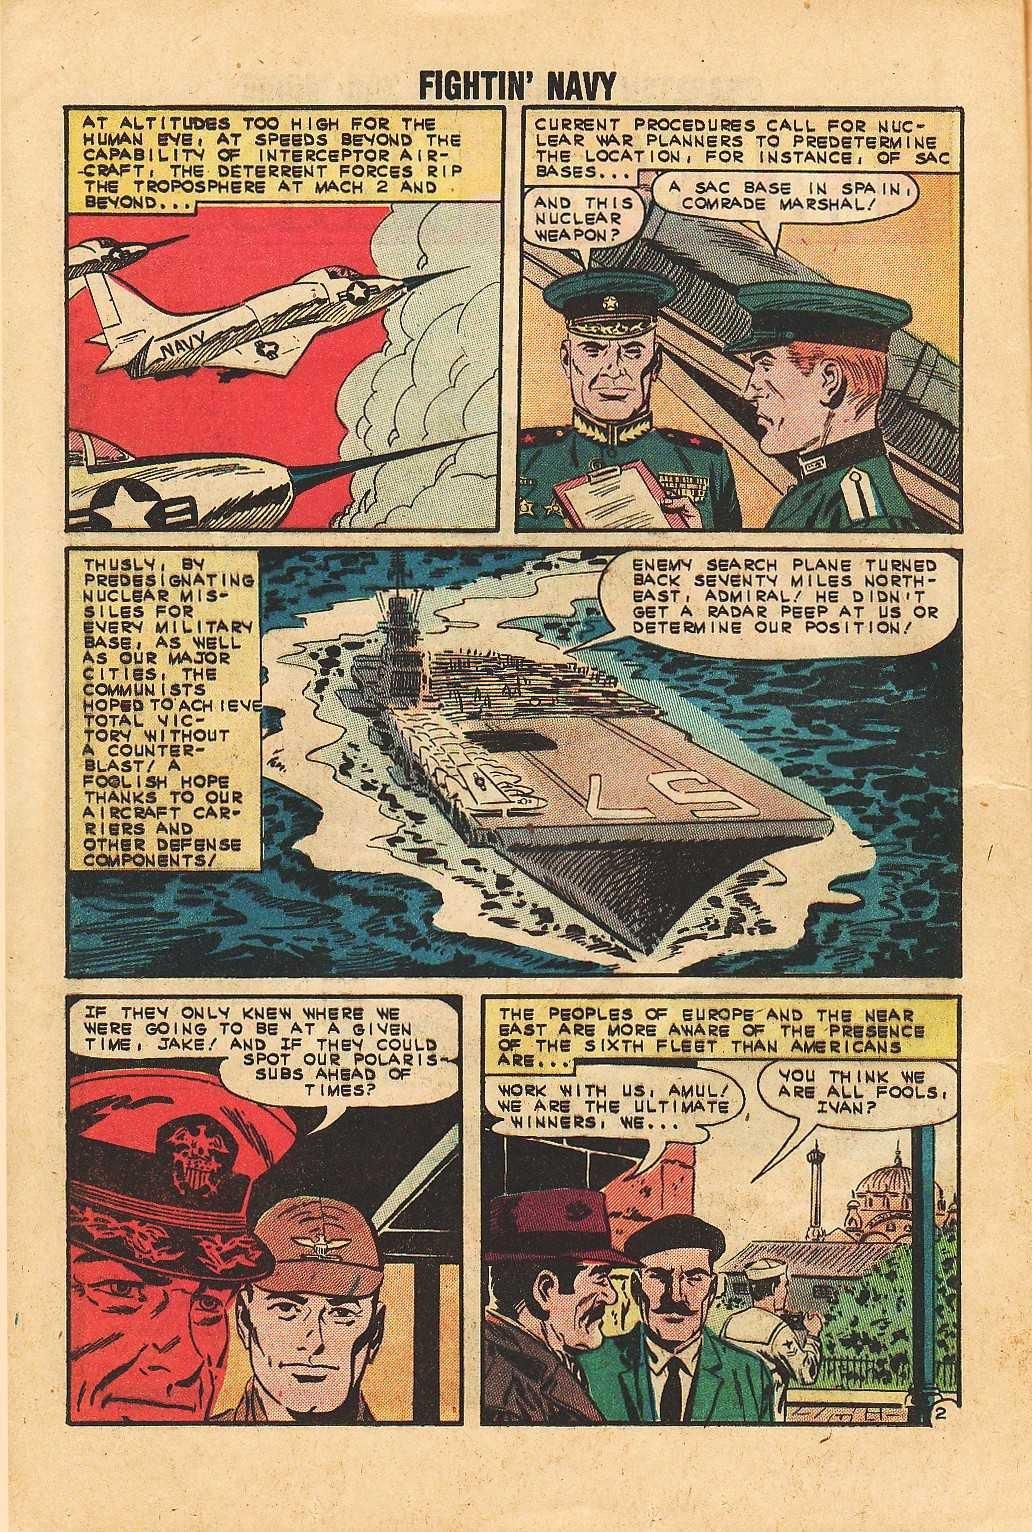 Read online Fightin' Navy comic -  Issue #113 - 12